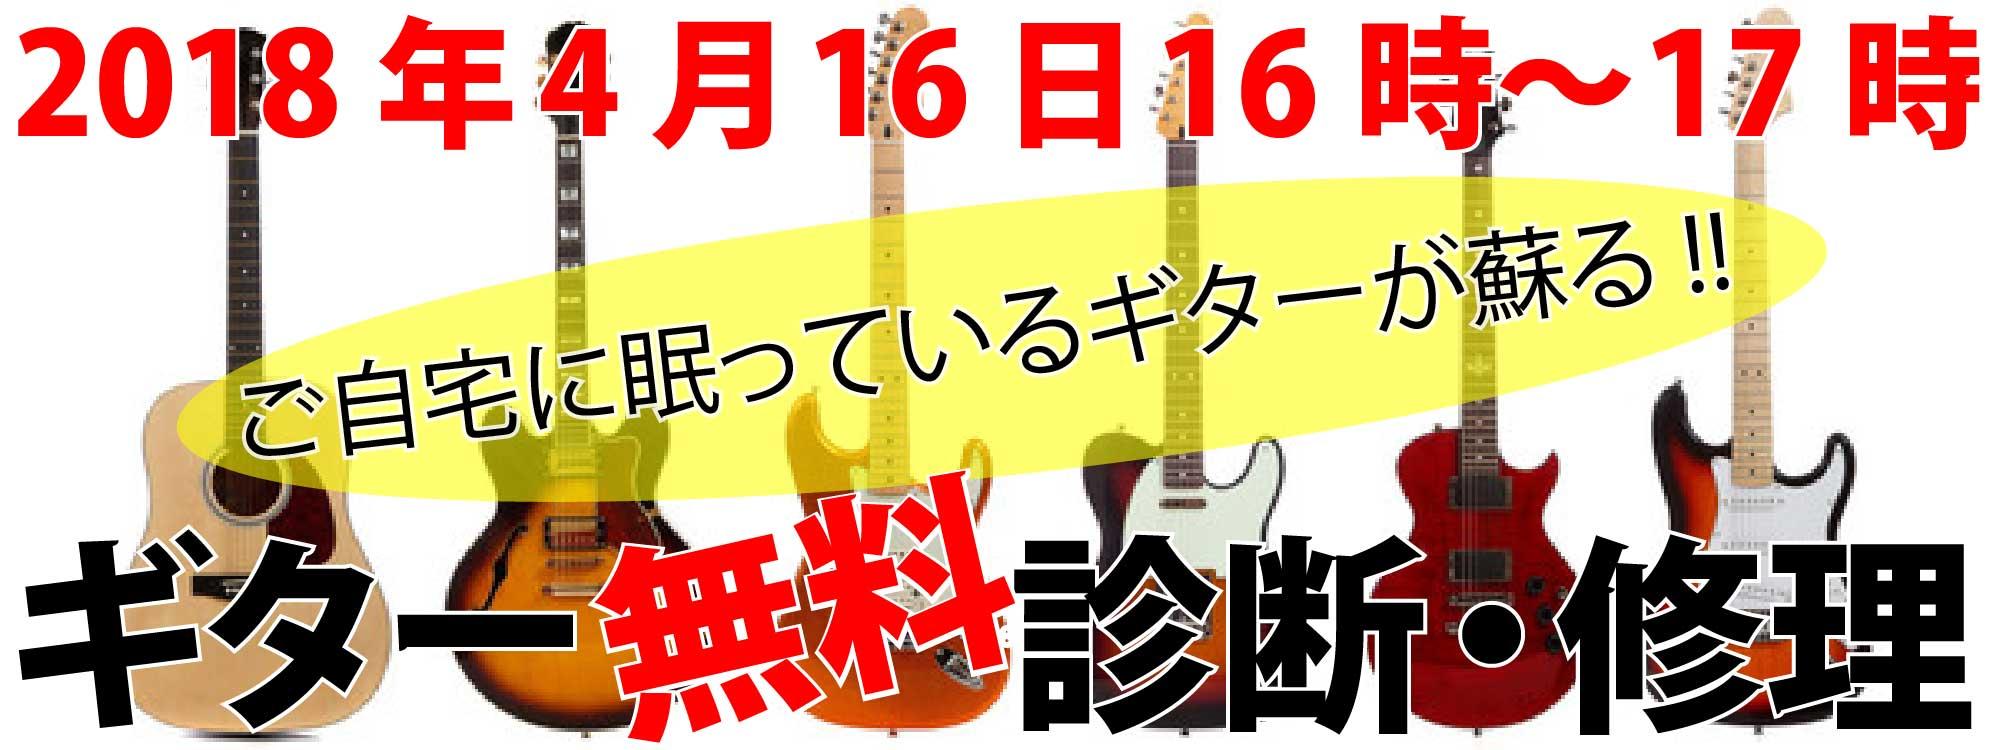 無料!!ギター診断2018年4月16日(16時~17時)